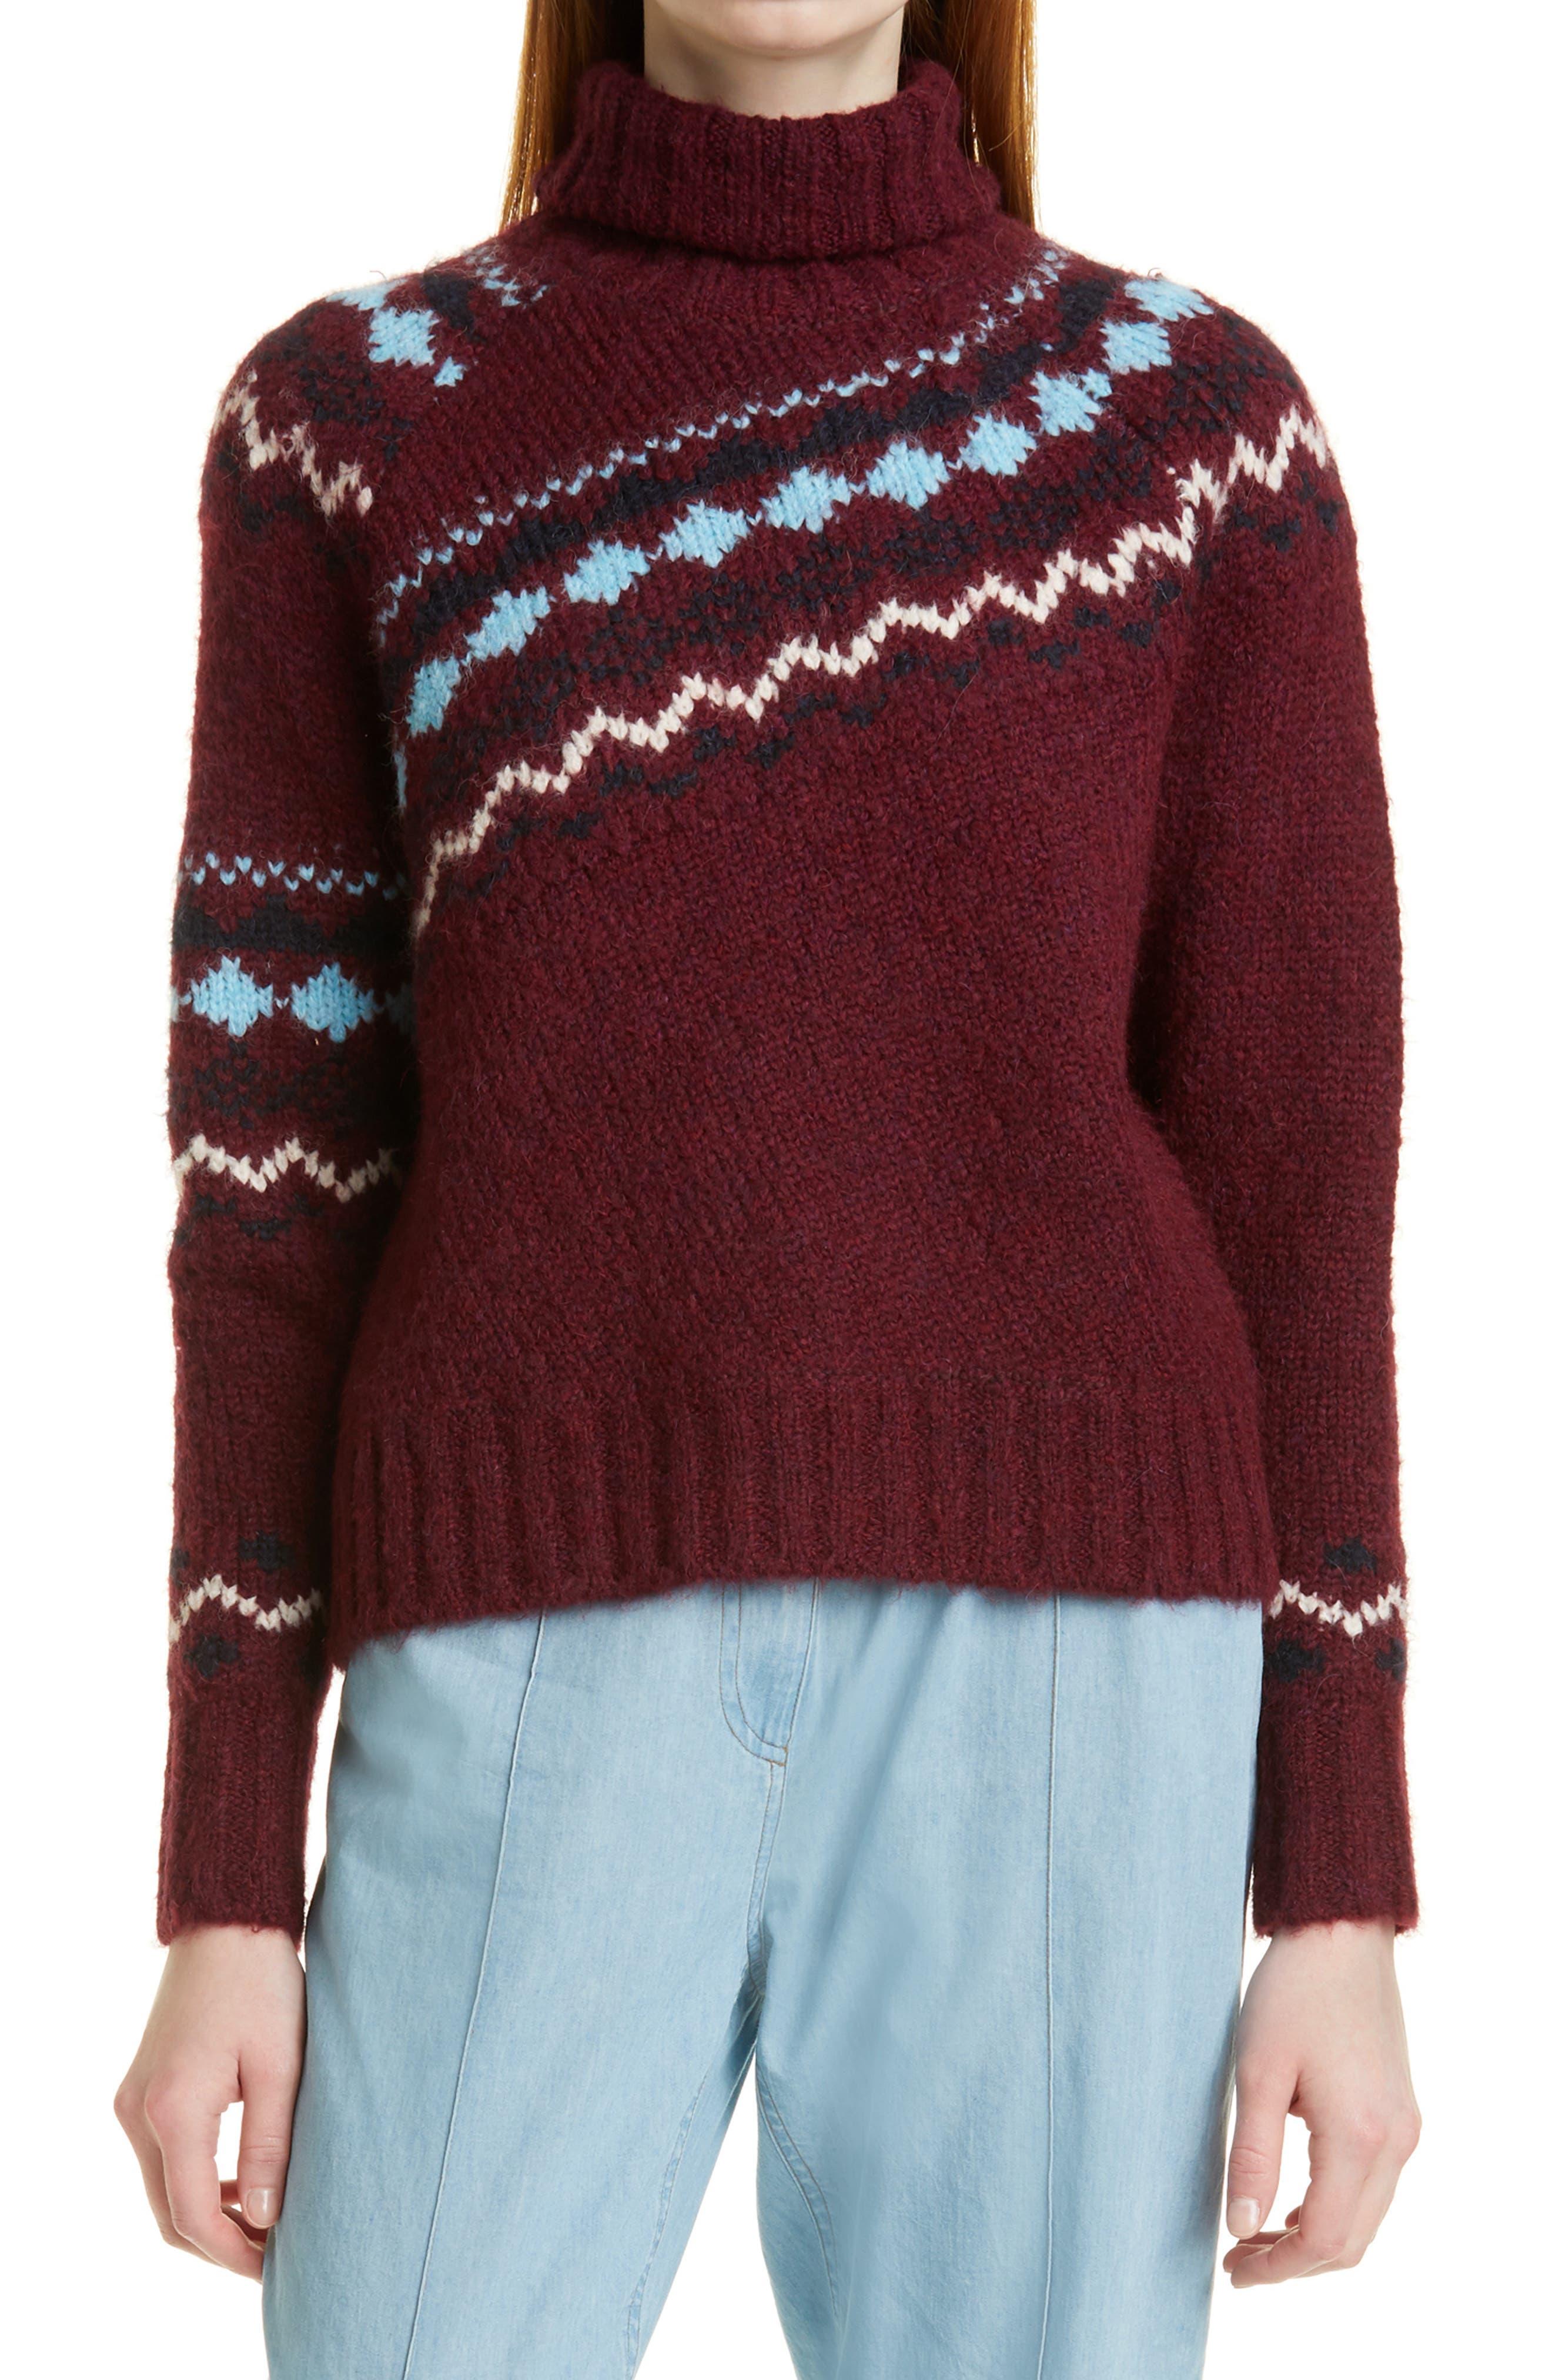 Grammer Fair Isle Alpaca Blend Turtleneck Sweater